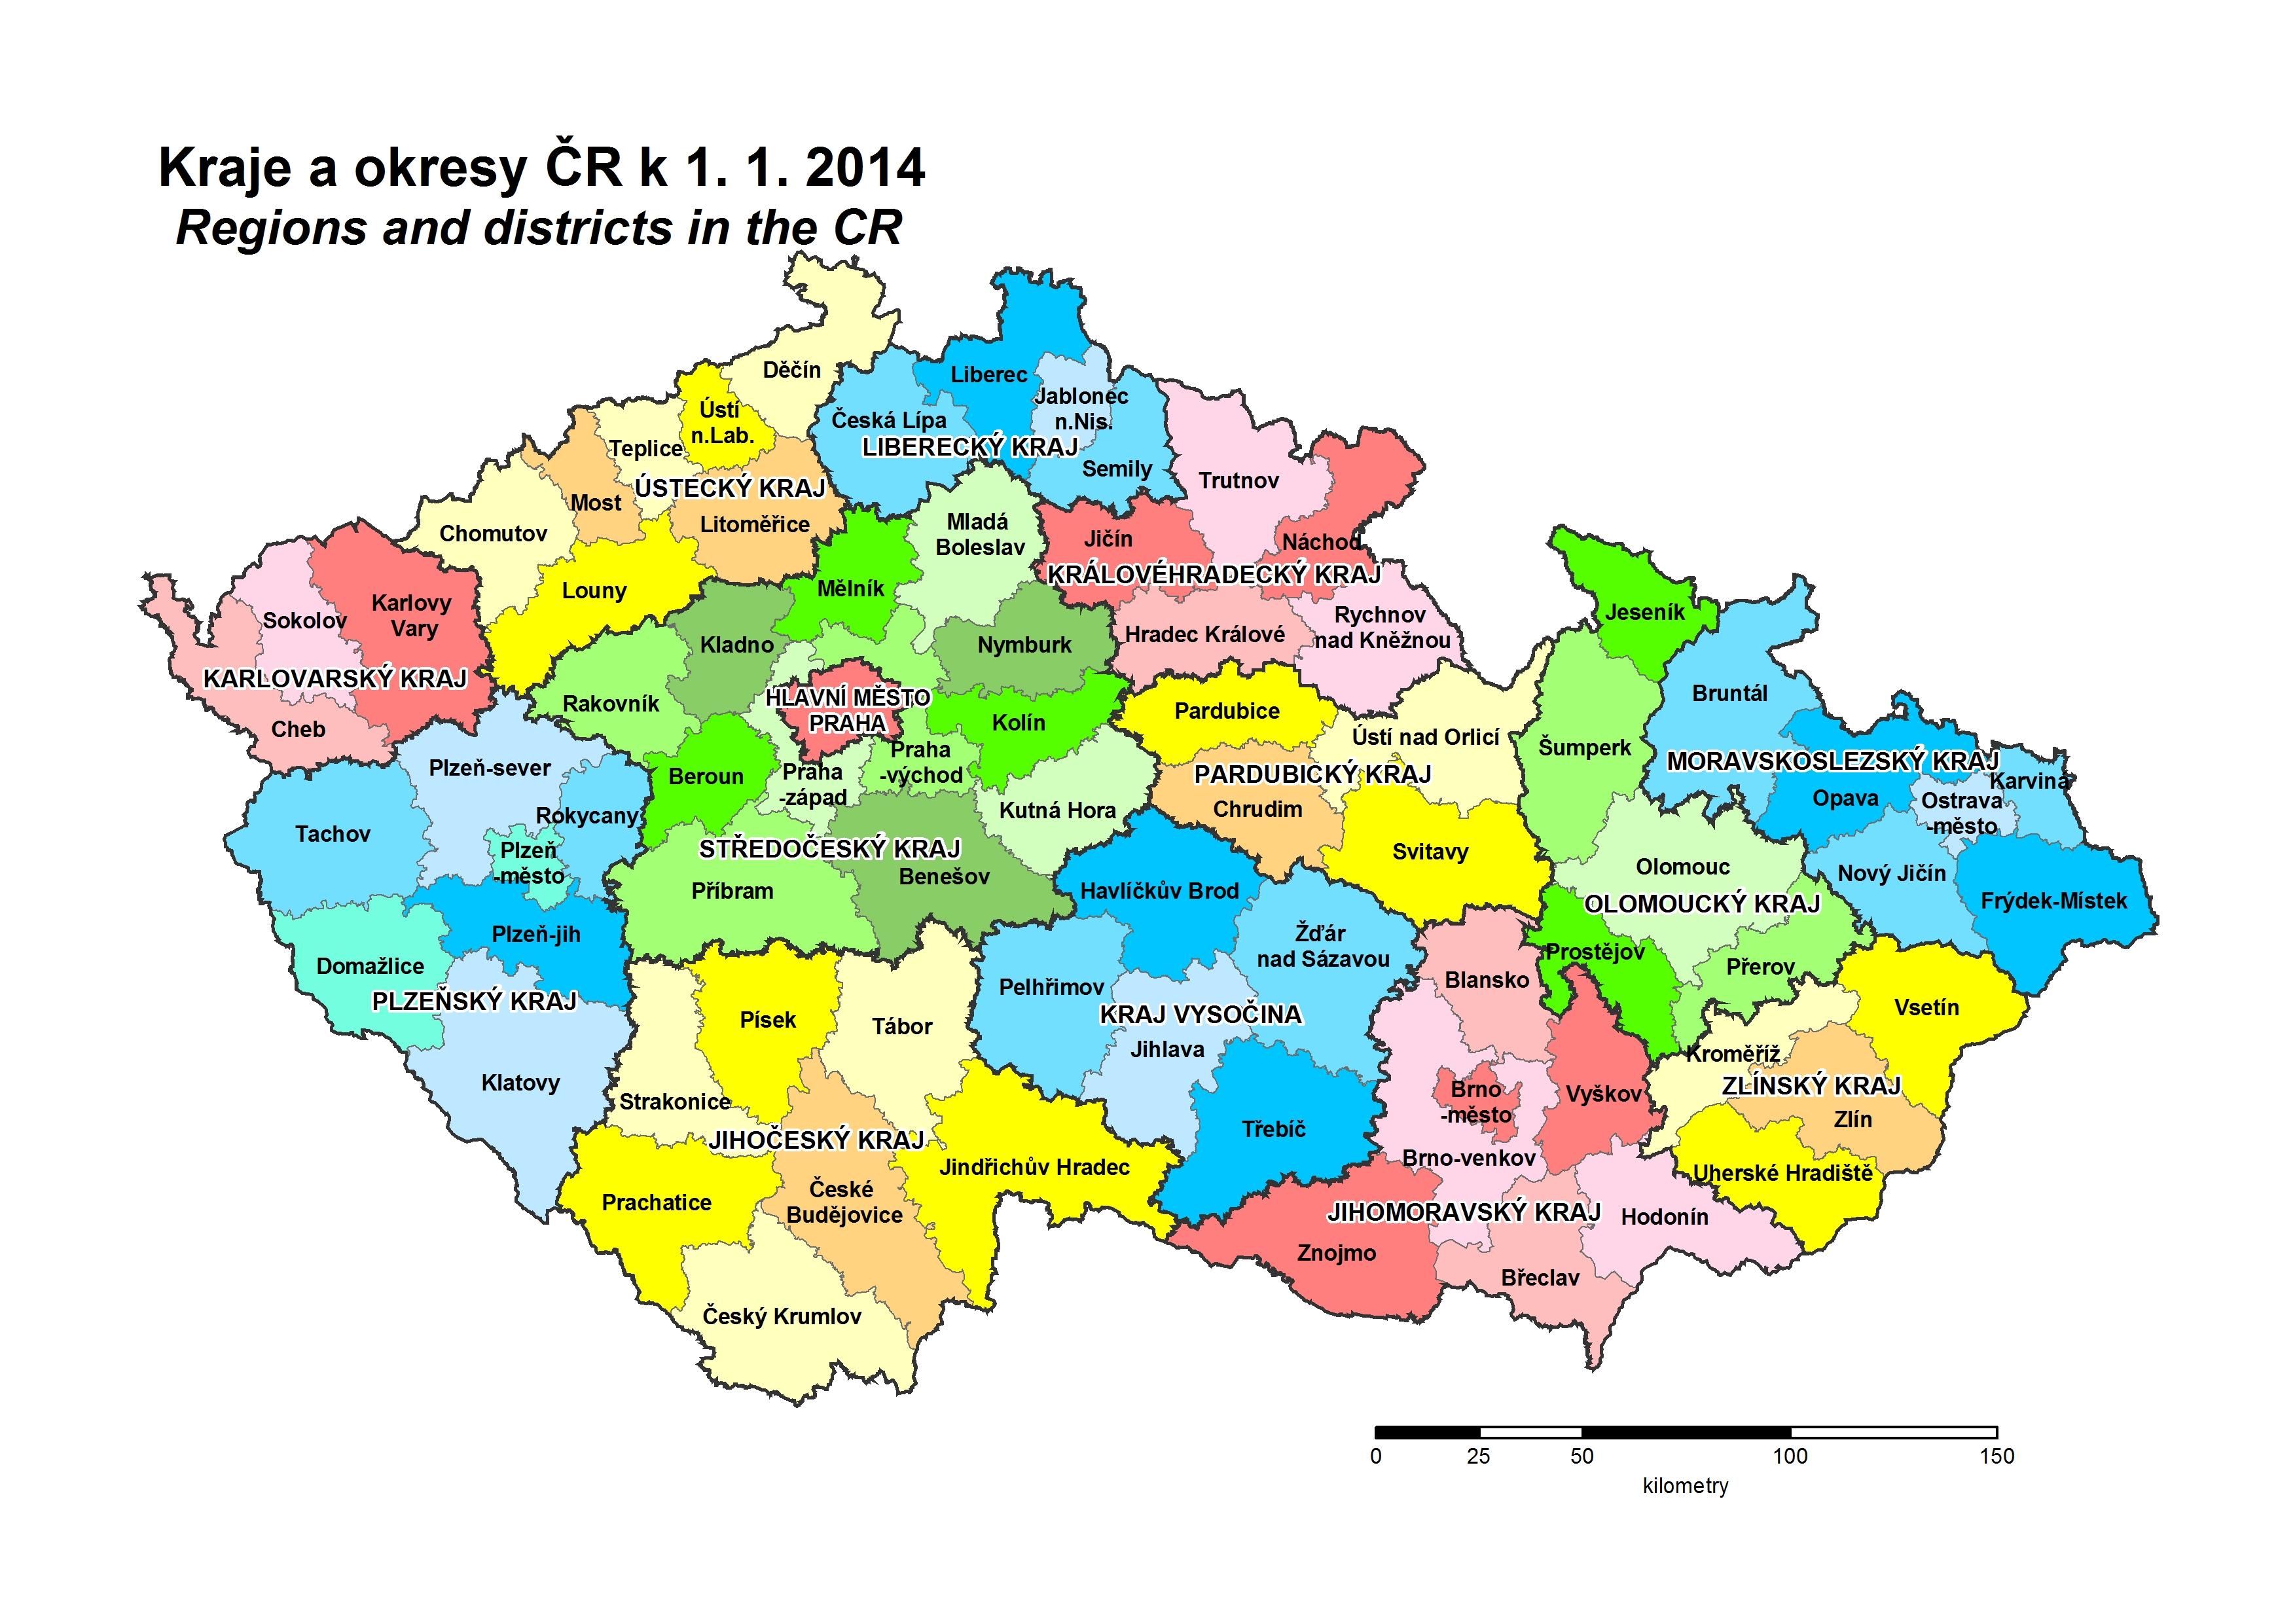 Maly Lexikon Obci Ceske Republiky 2014 Csu